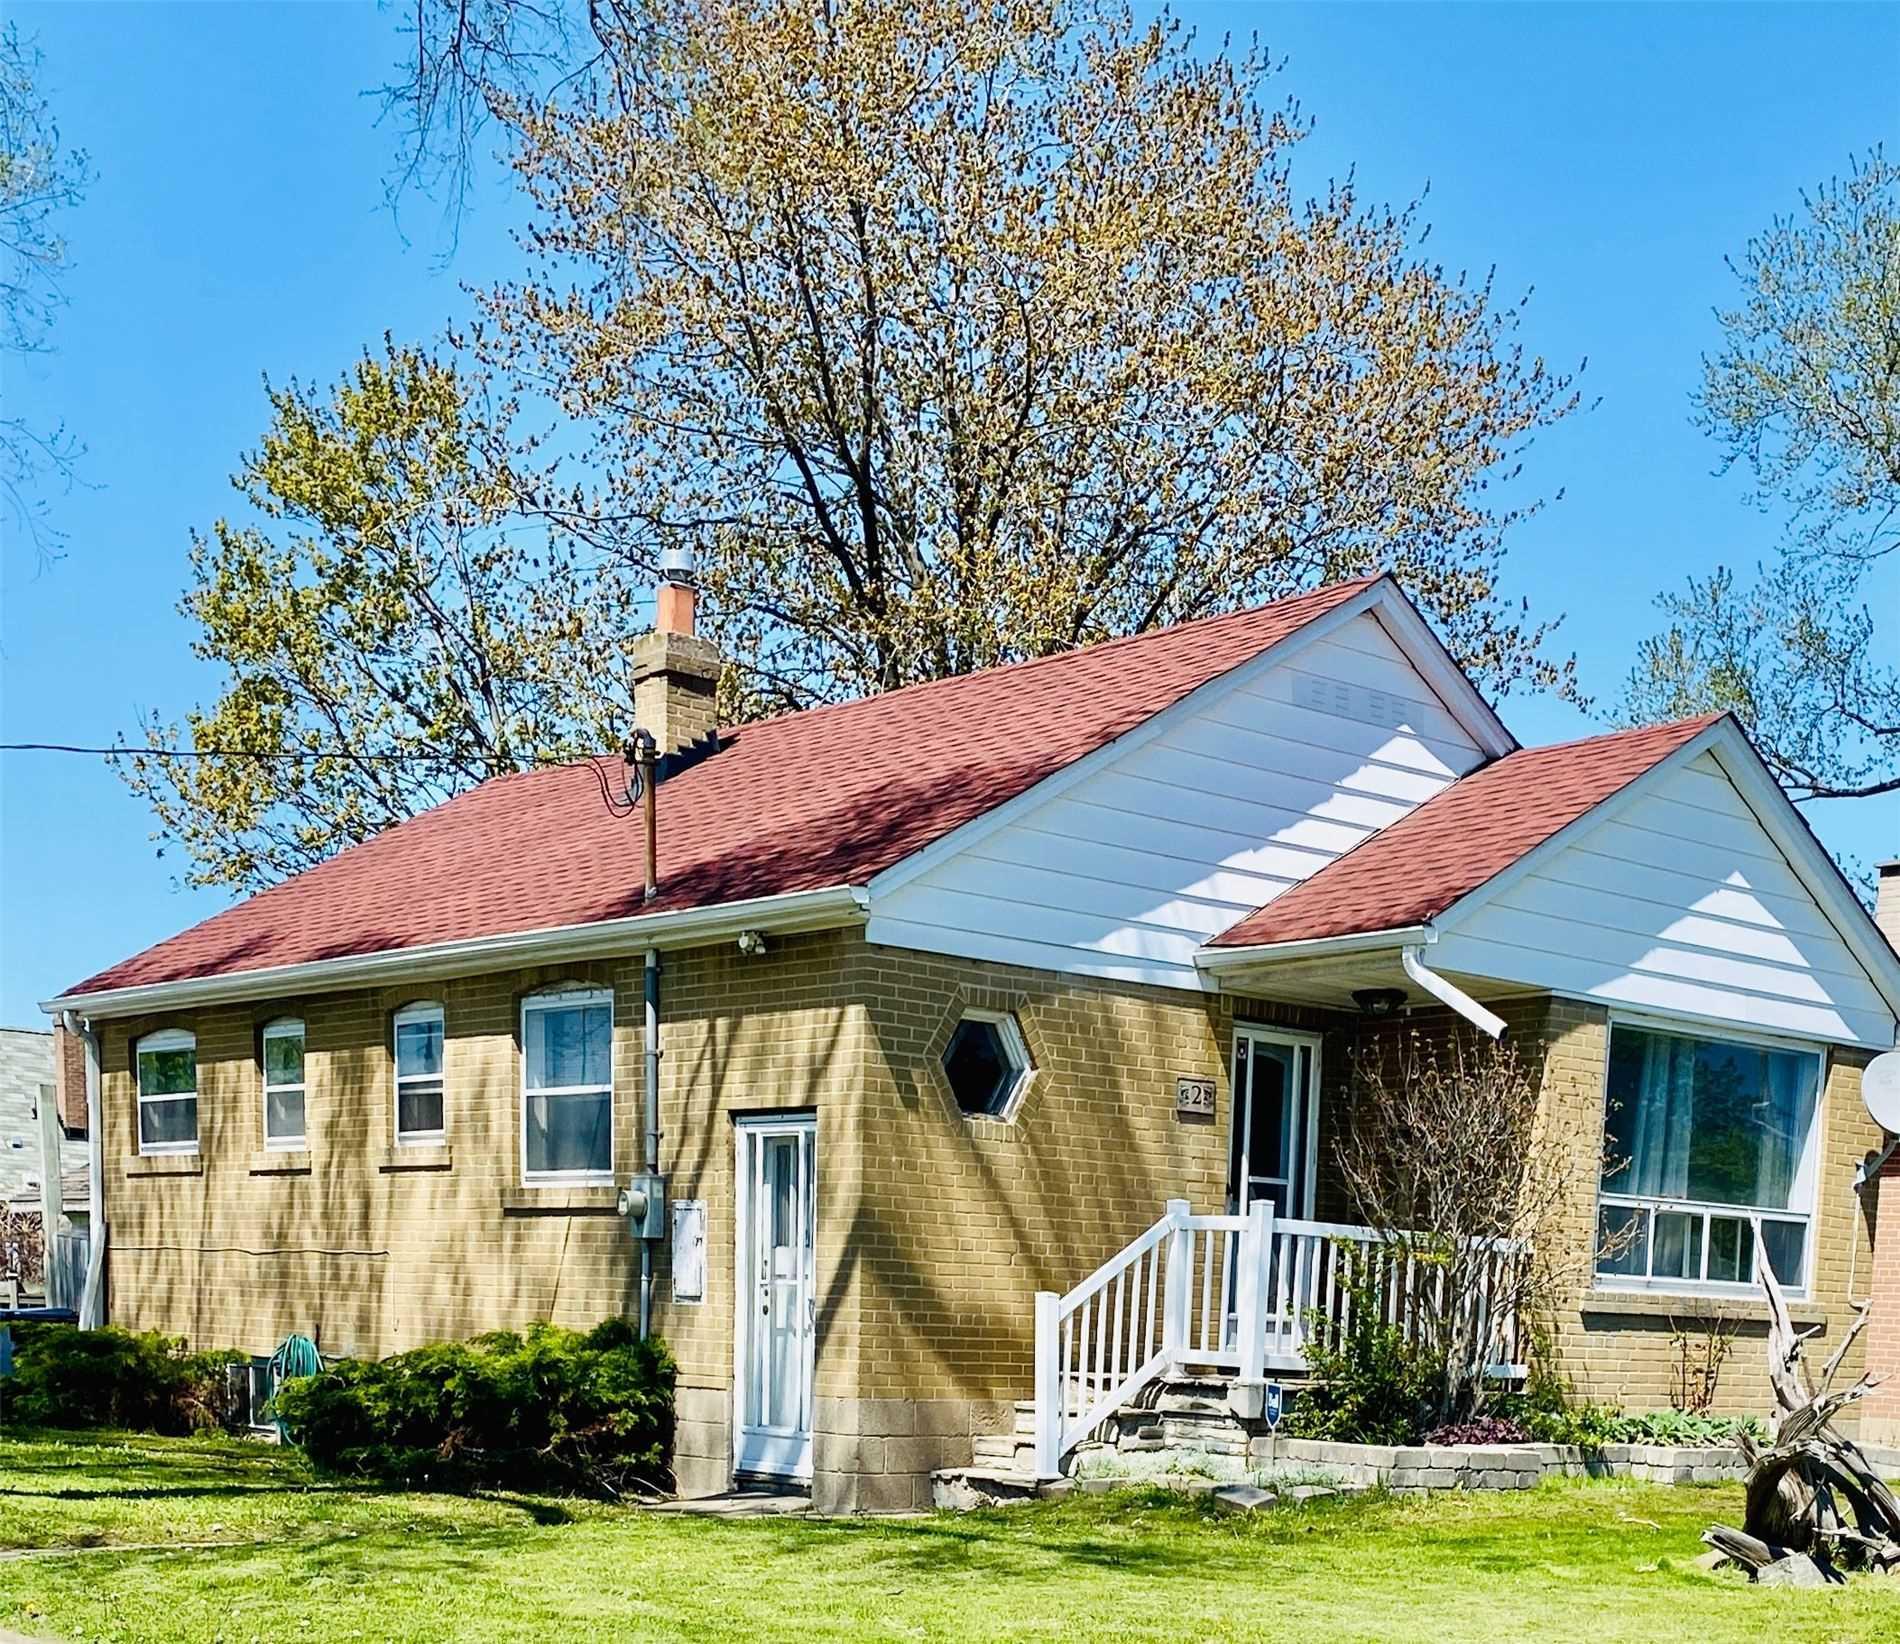 2 Densmore Ave, Toronto, Ontario M9W1V2, 3 Bedrooms Bedrooms, 5 Rooms Rooms,2 BathroomsBathrooms,Detached,For Sale,Densmore,W4767431